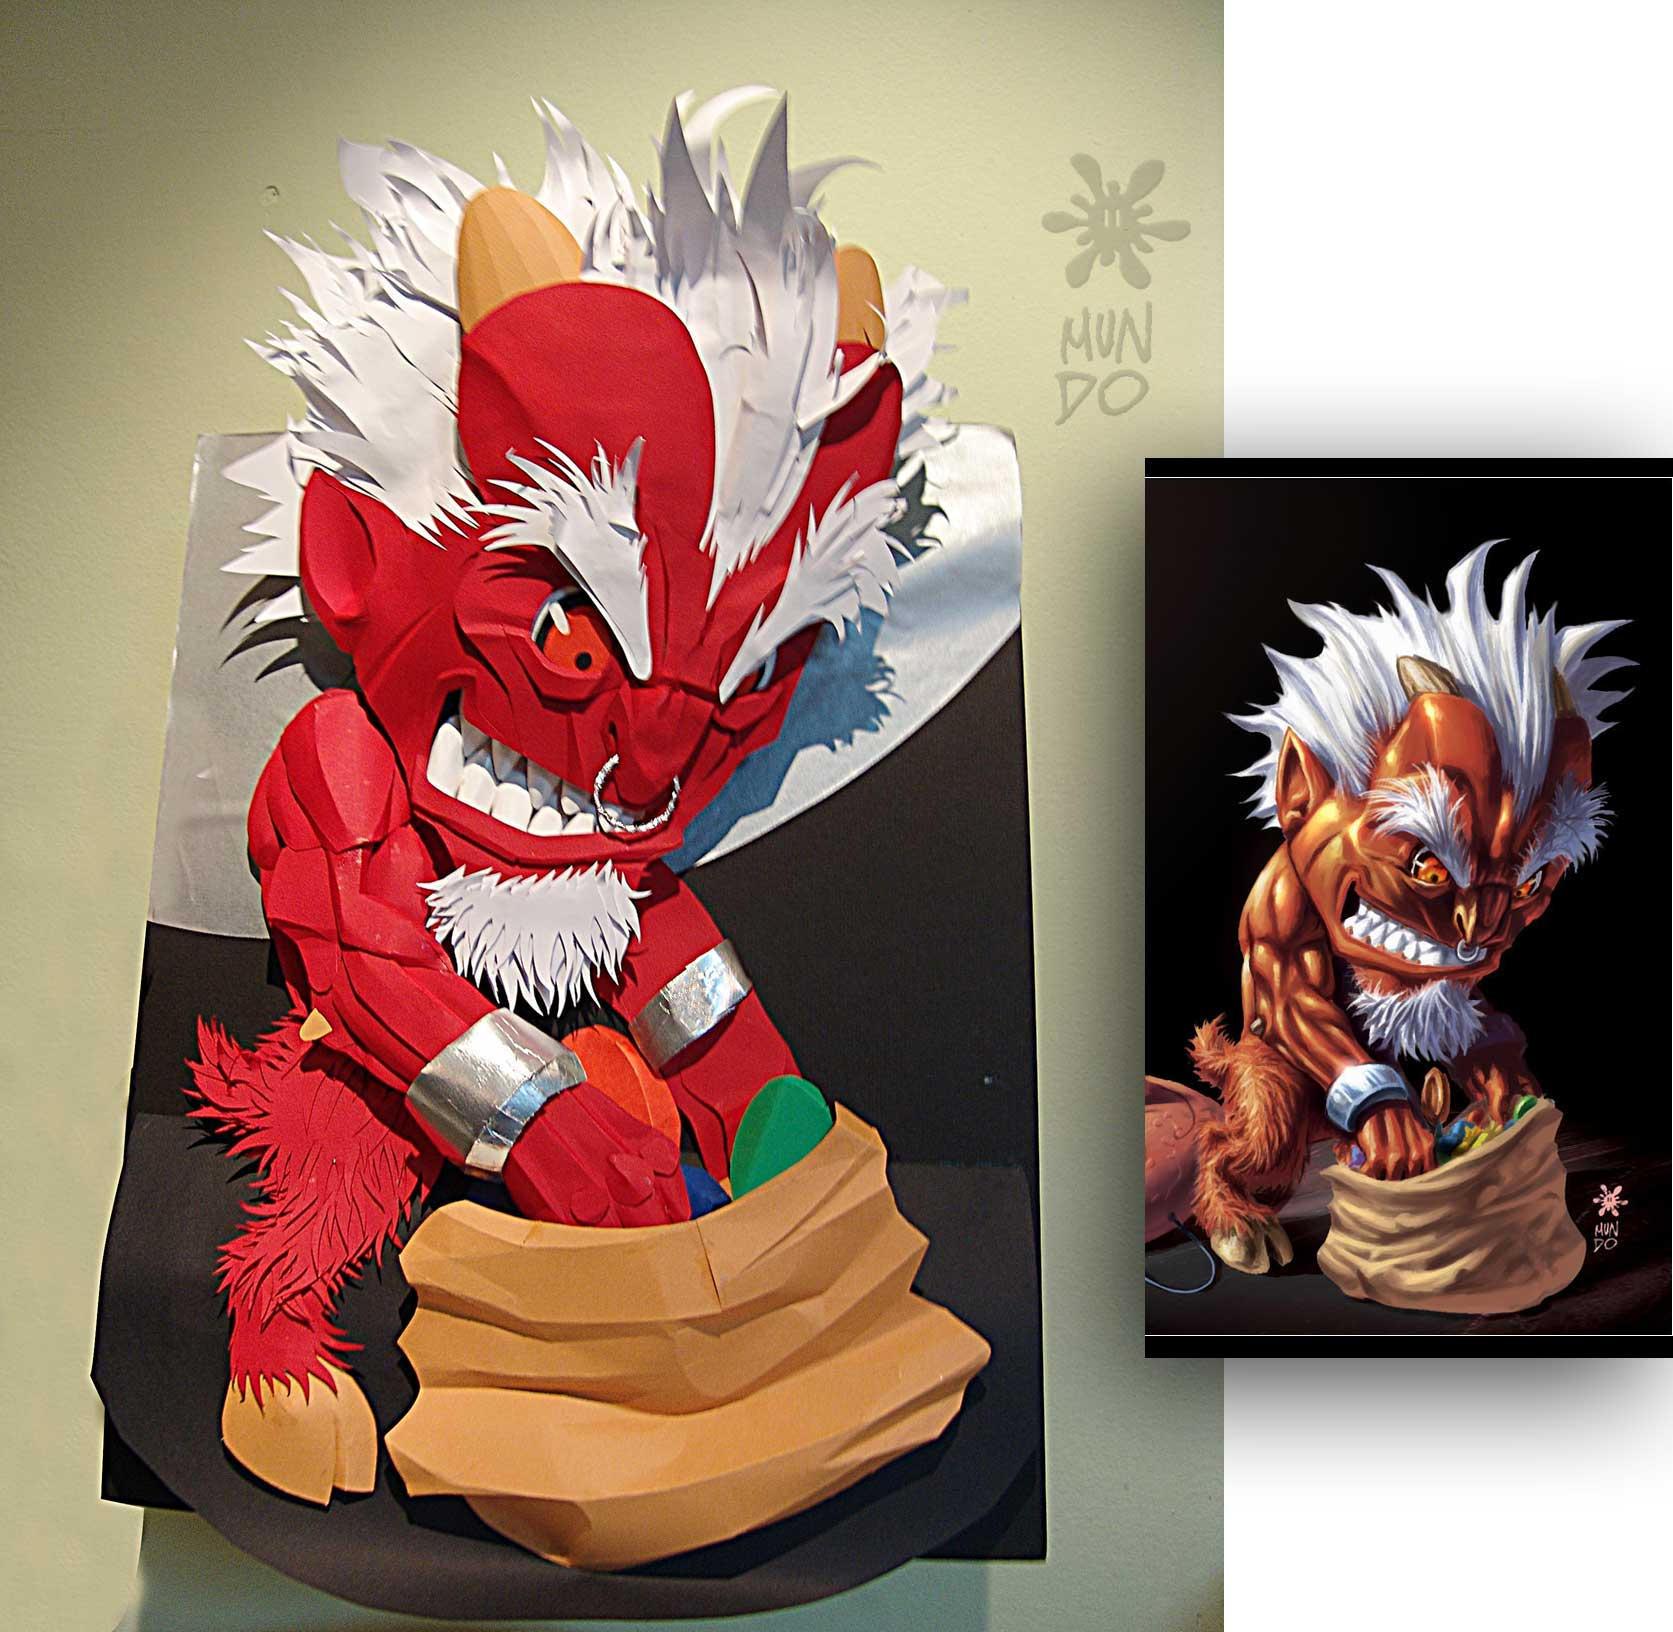 Paper craft devil by Mundokk